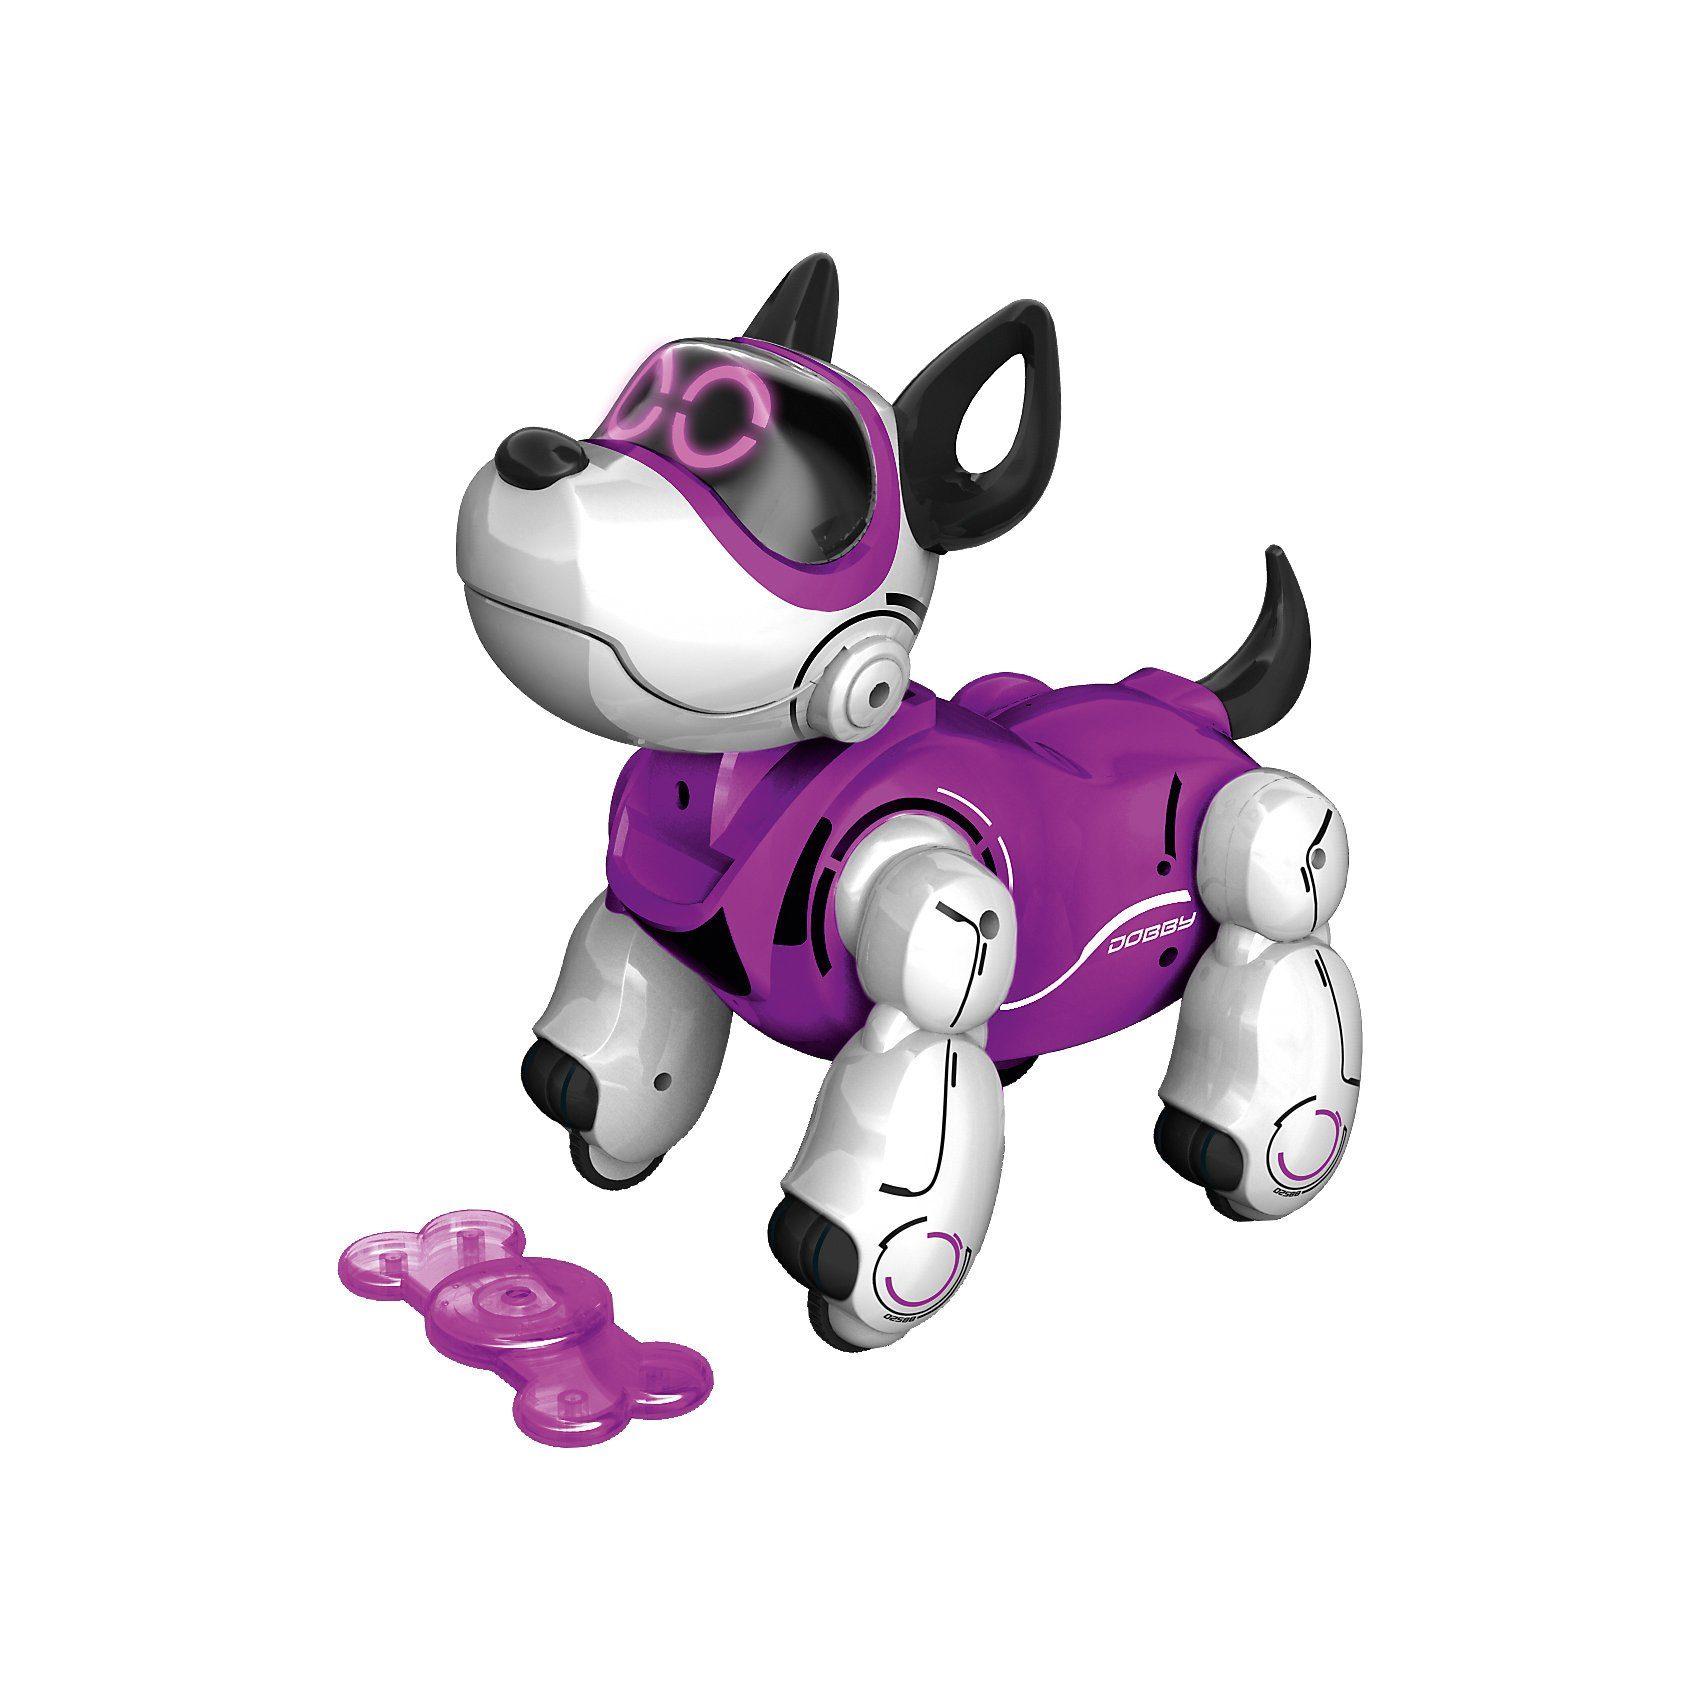 Silverlit Pupbo pink